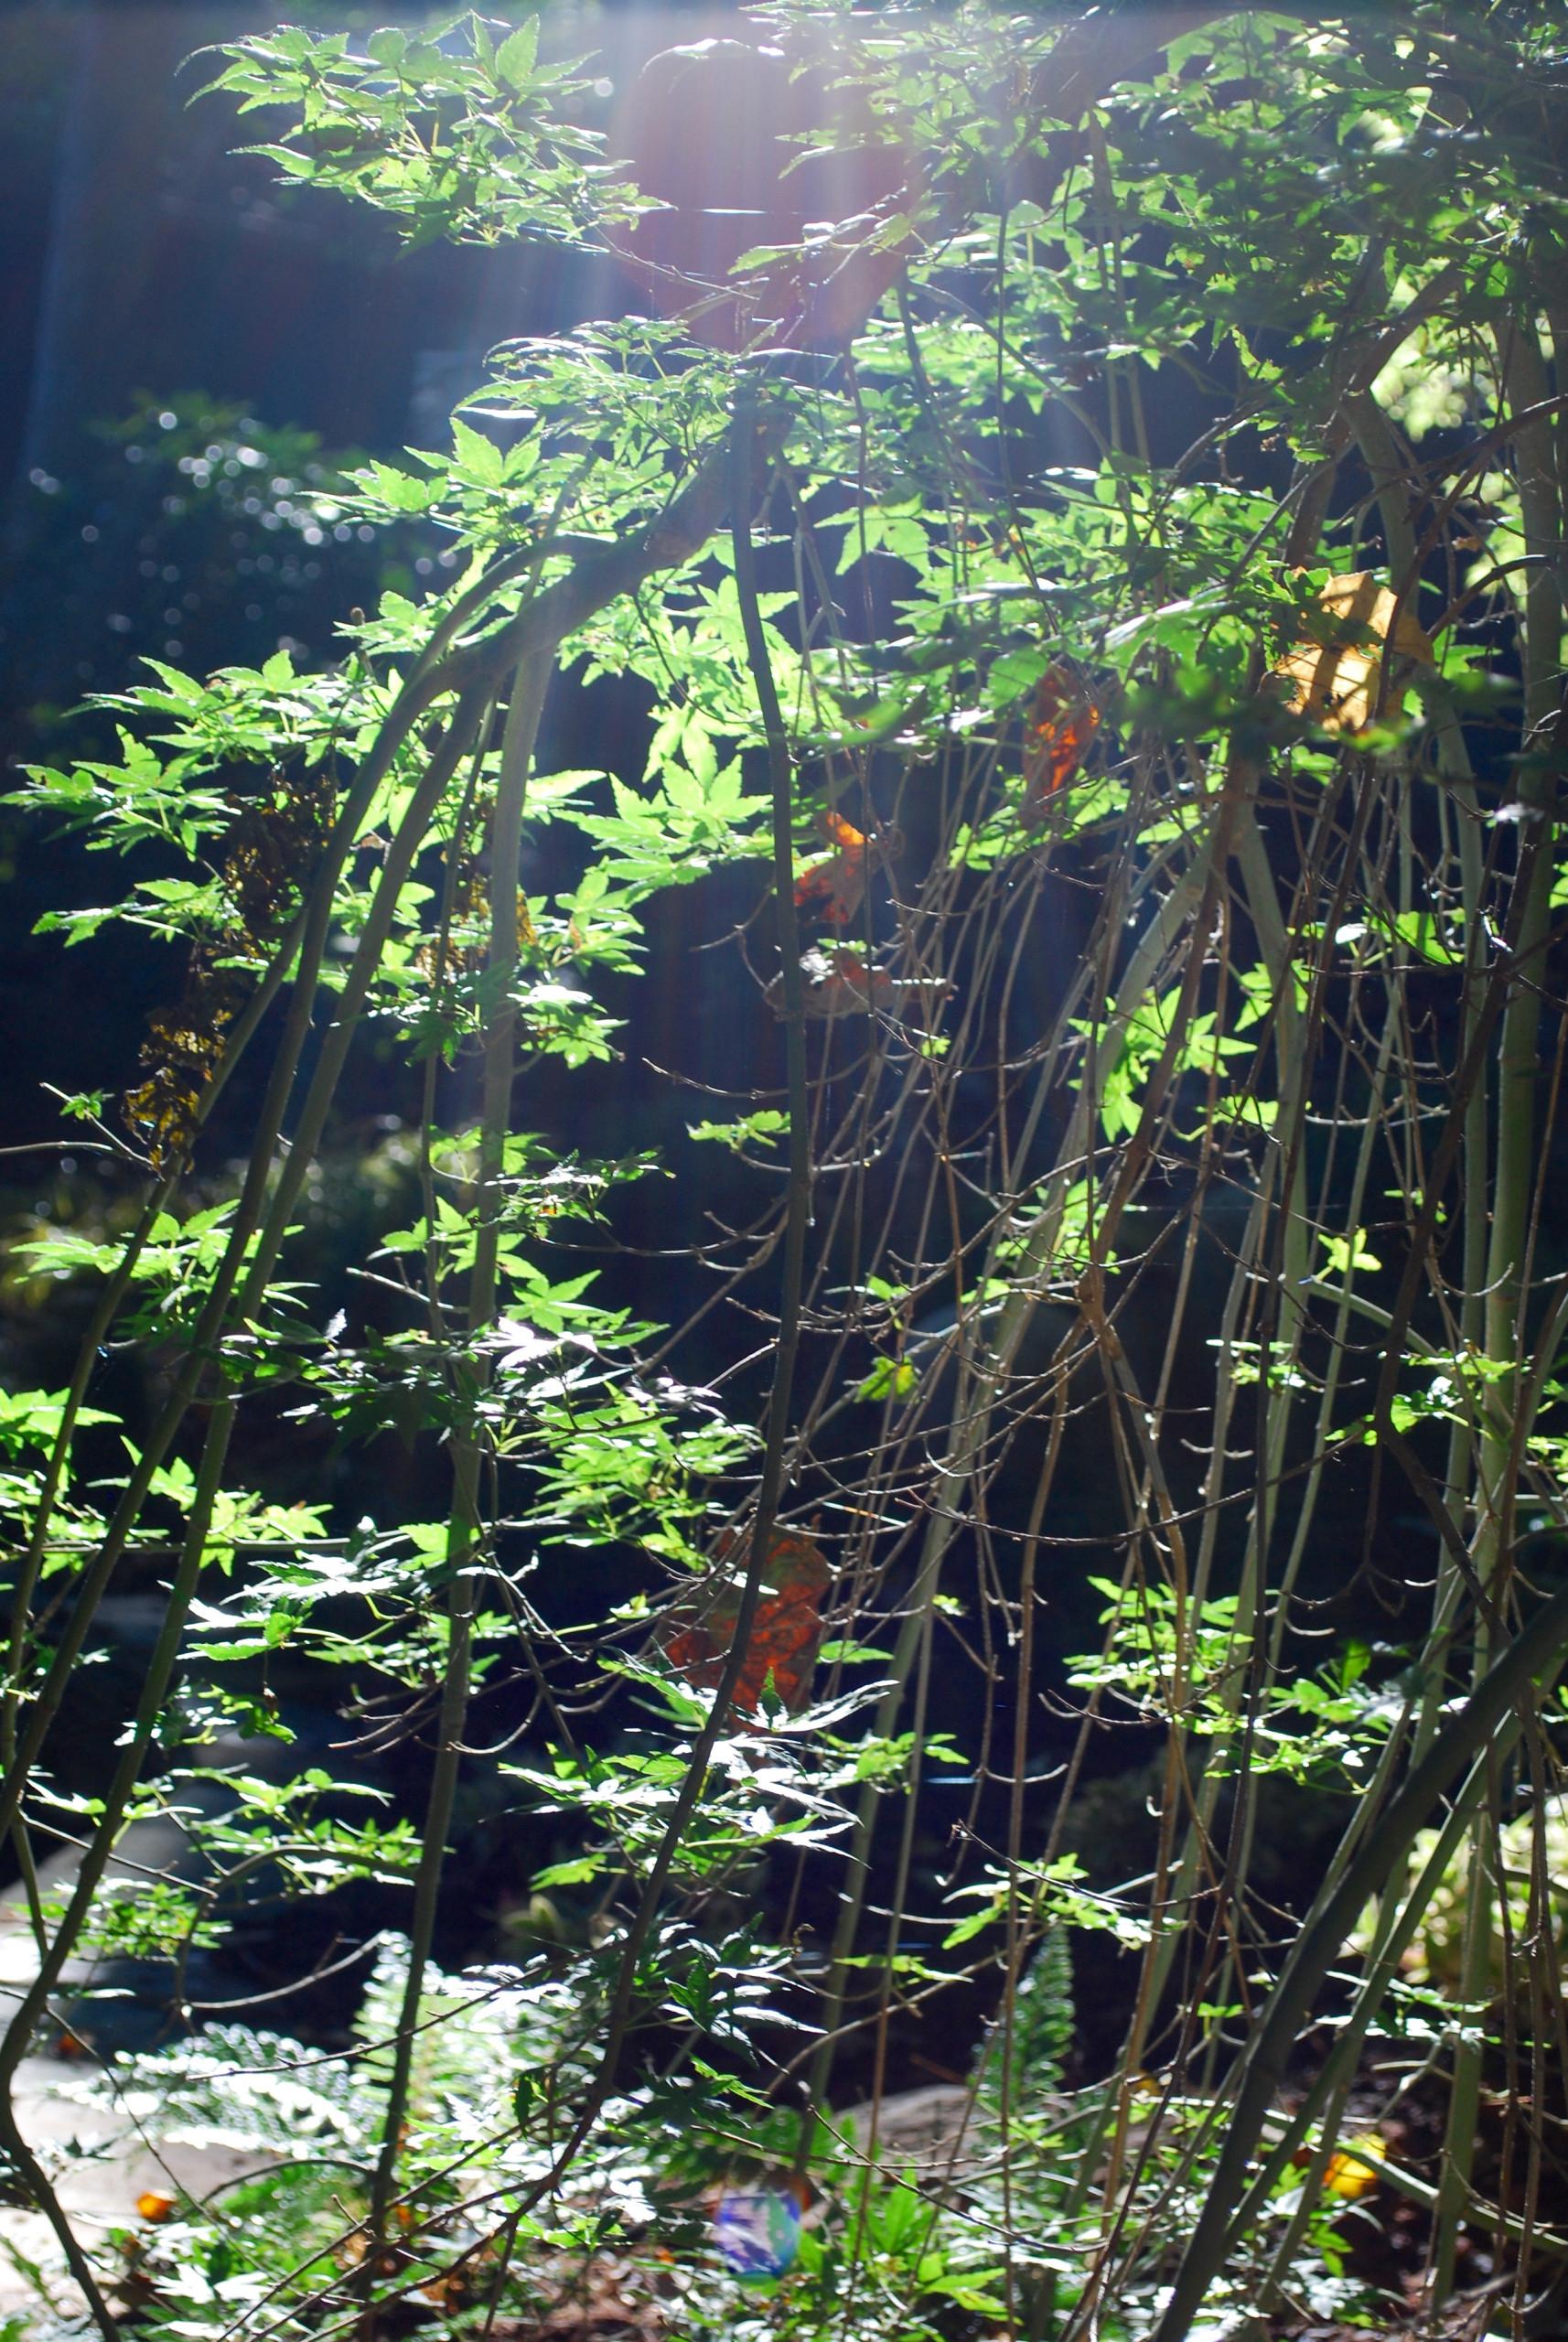 Acer palmatum 'Ryusen', backlit